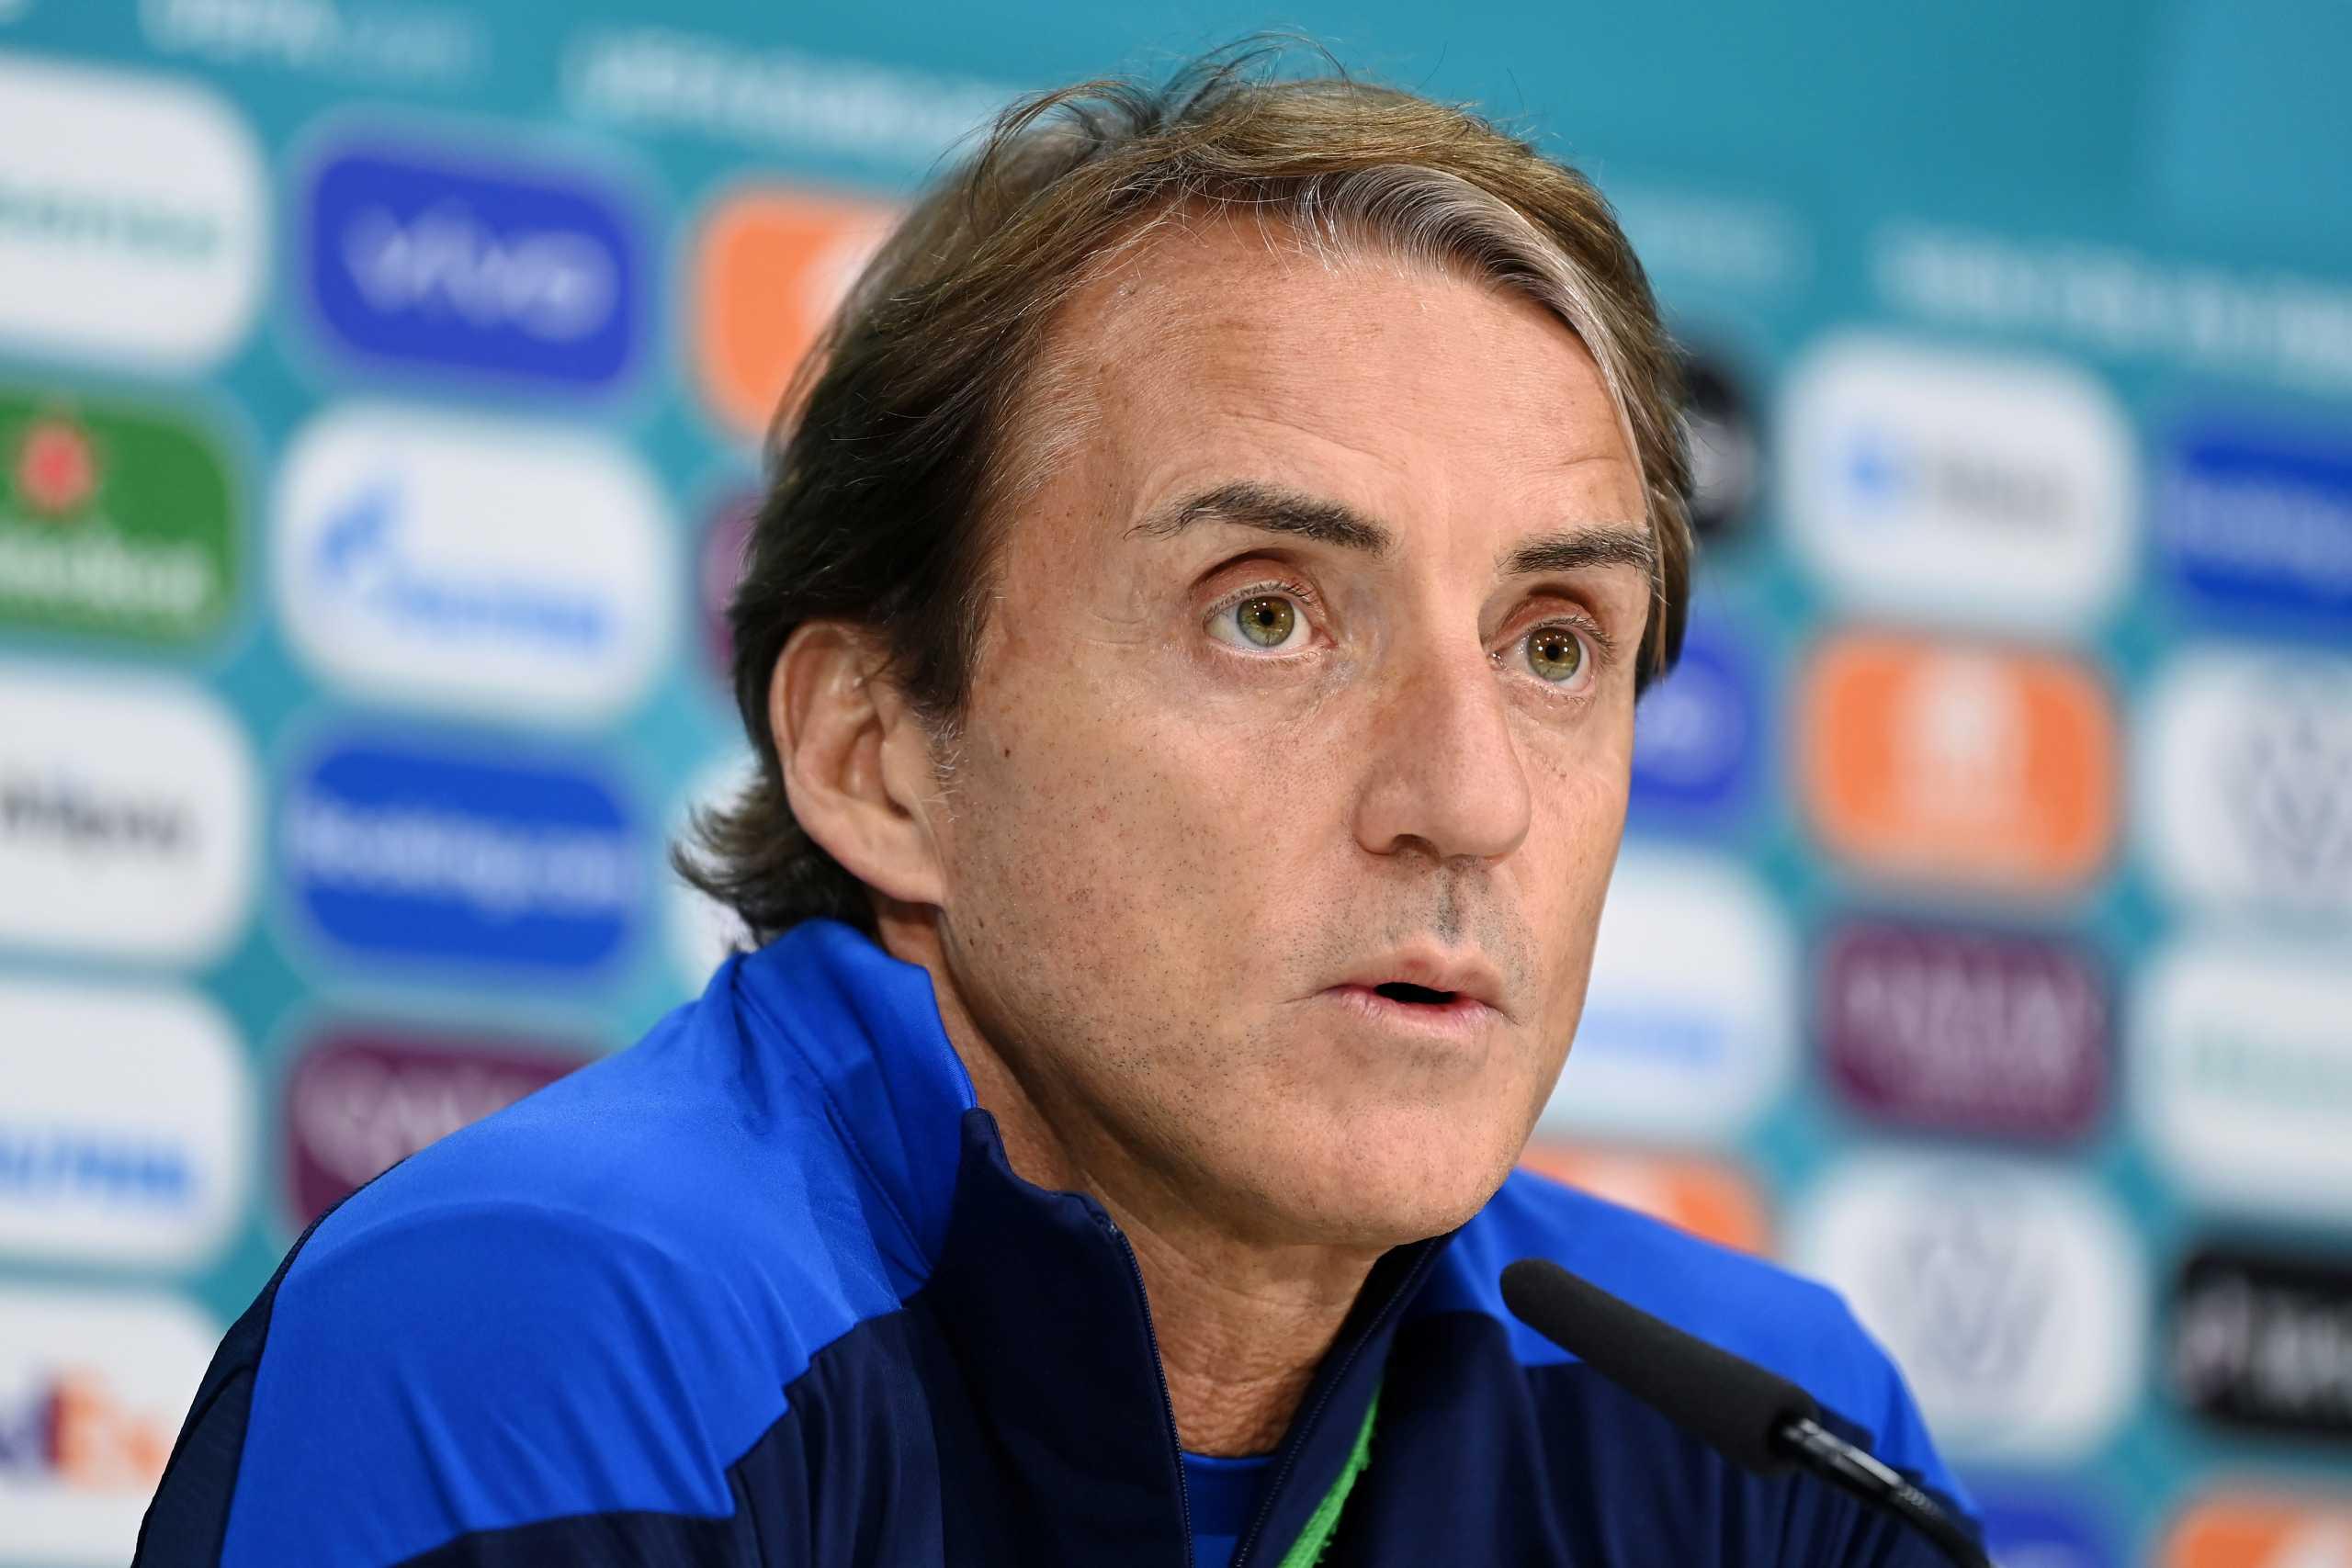 Euro 2020, Μαντσίνι: «Θέλω να πετύχω ως προπονητής αυτό που δεν έκανα ως παίκτης»